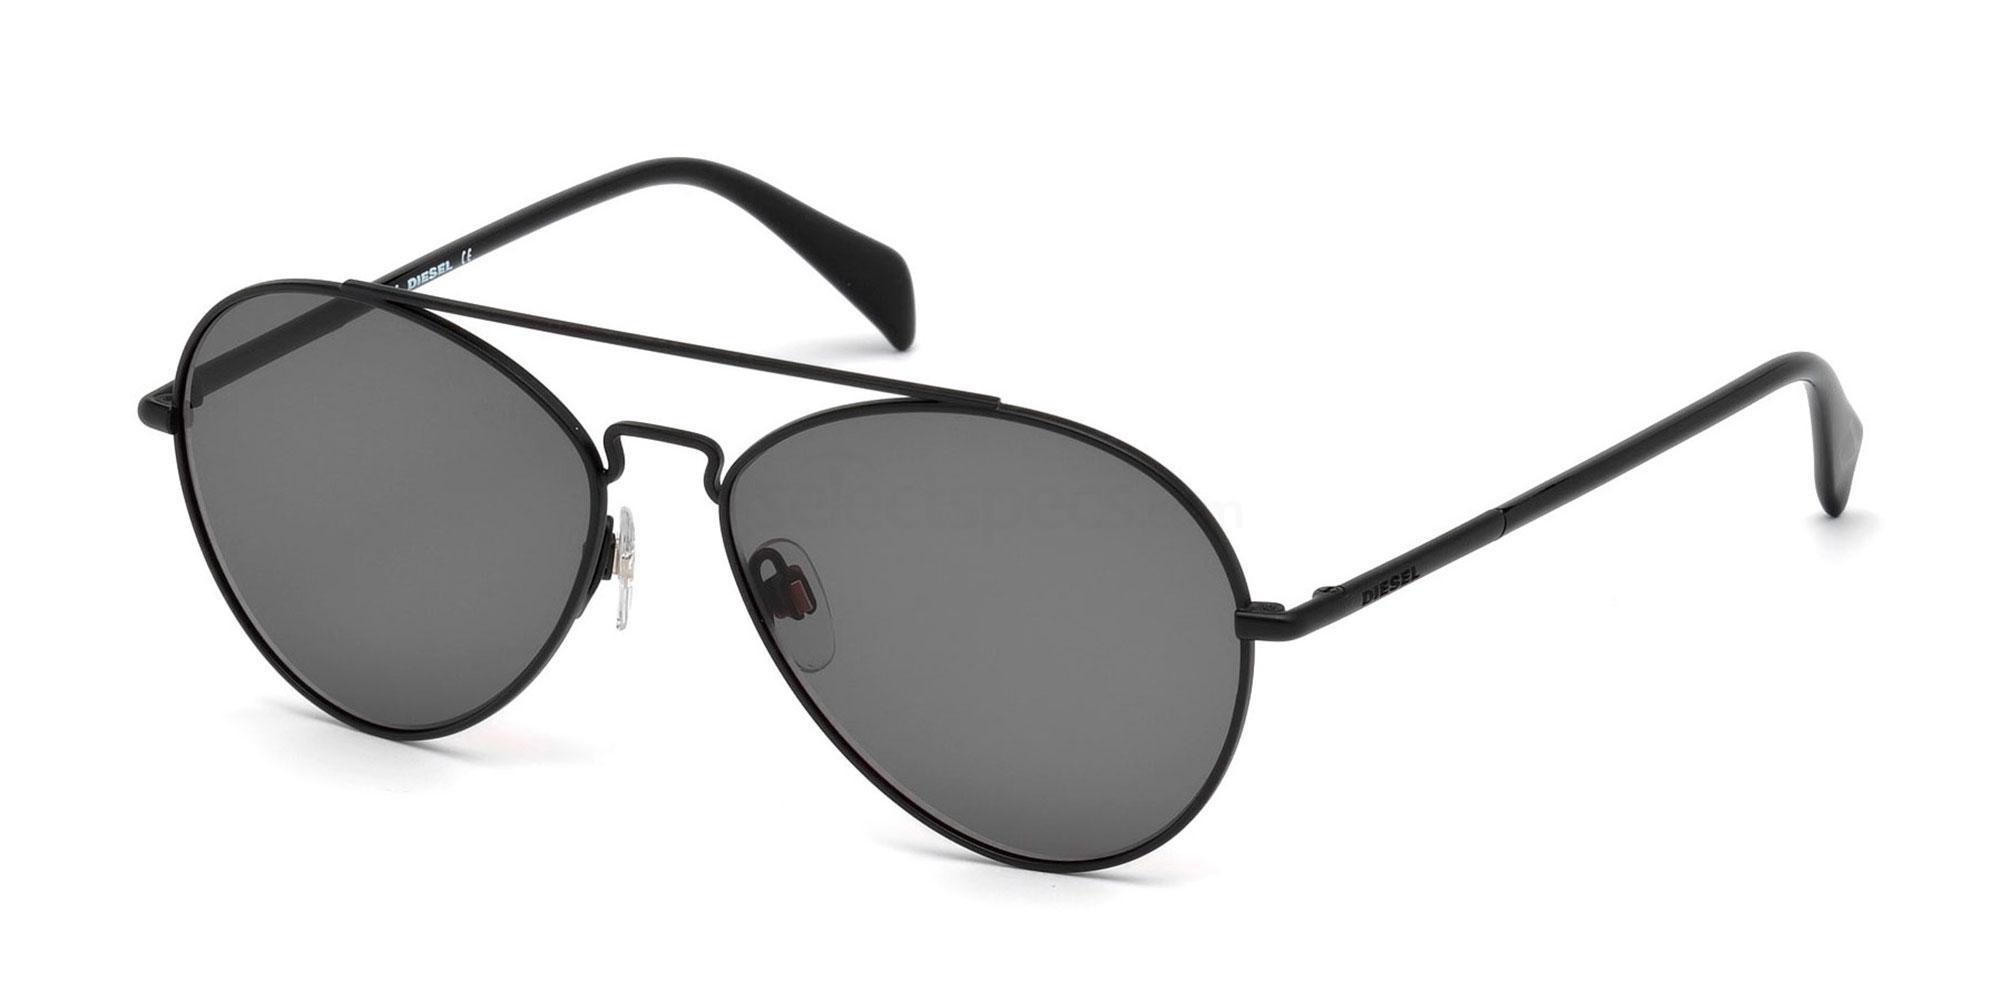 02A DL0193 Sunglasses, Diesel